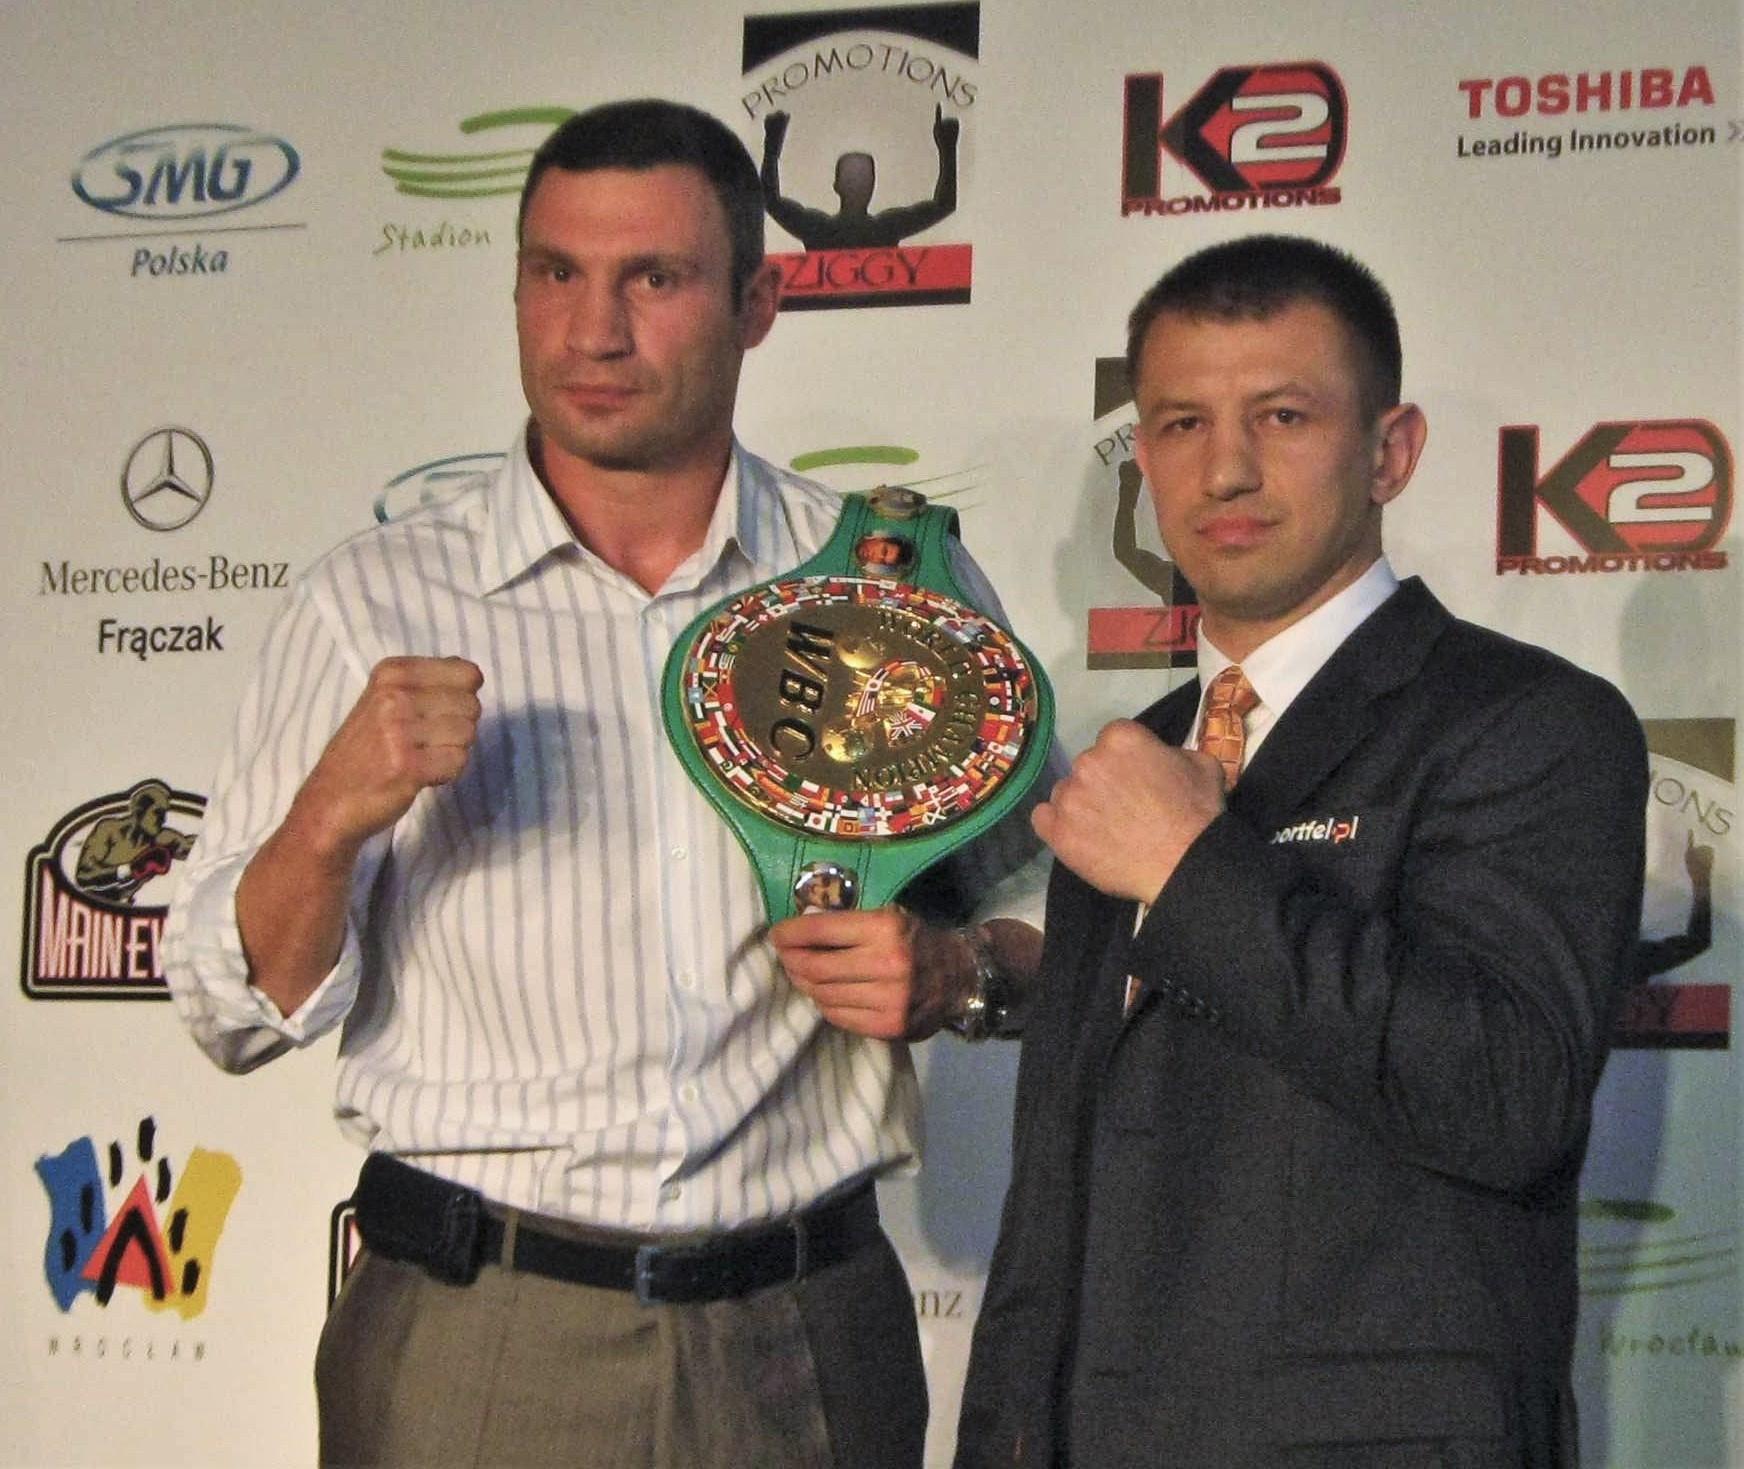 Bo boxer wladimir klitschko wikipedia the -  Image Result For Wladimir Klitschko Wikipedia